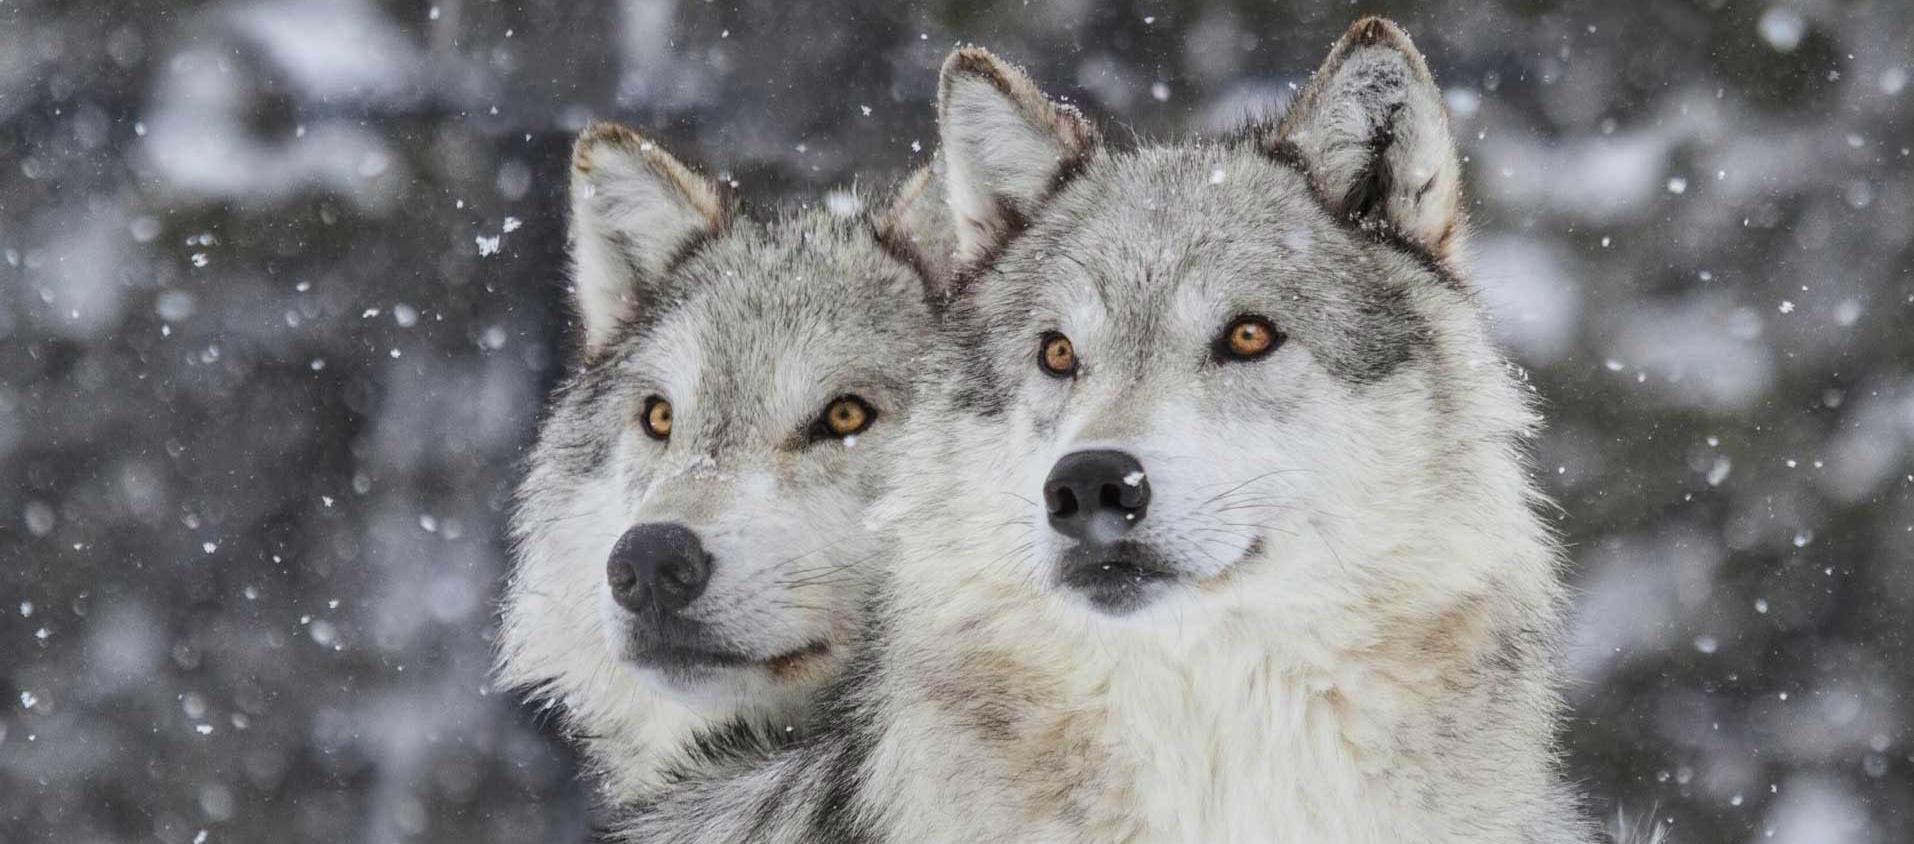 Wolves Image on the Slider